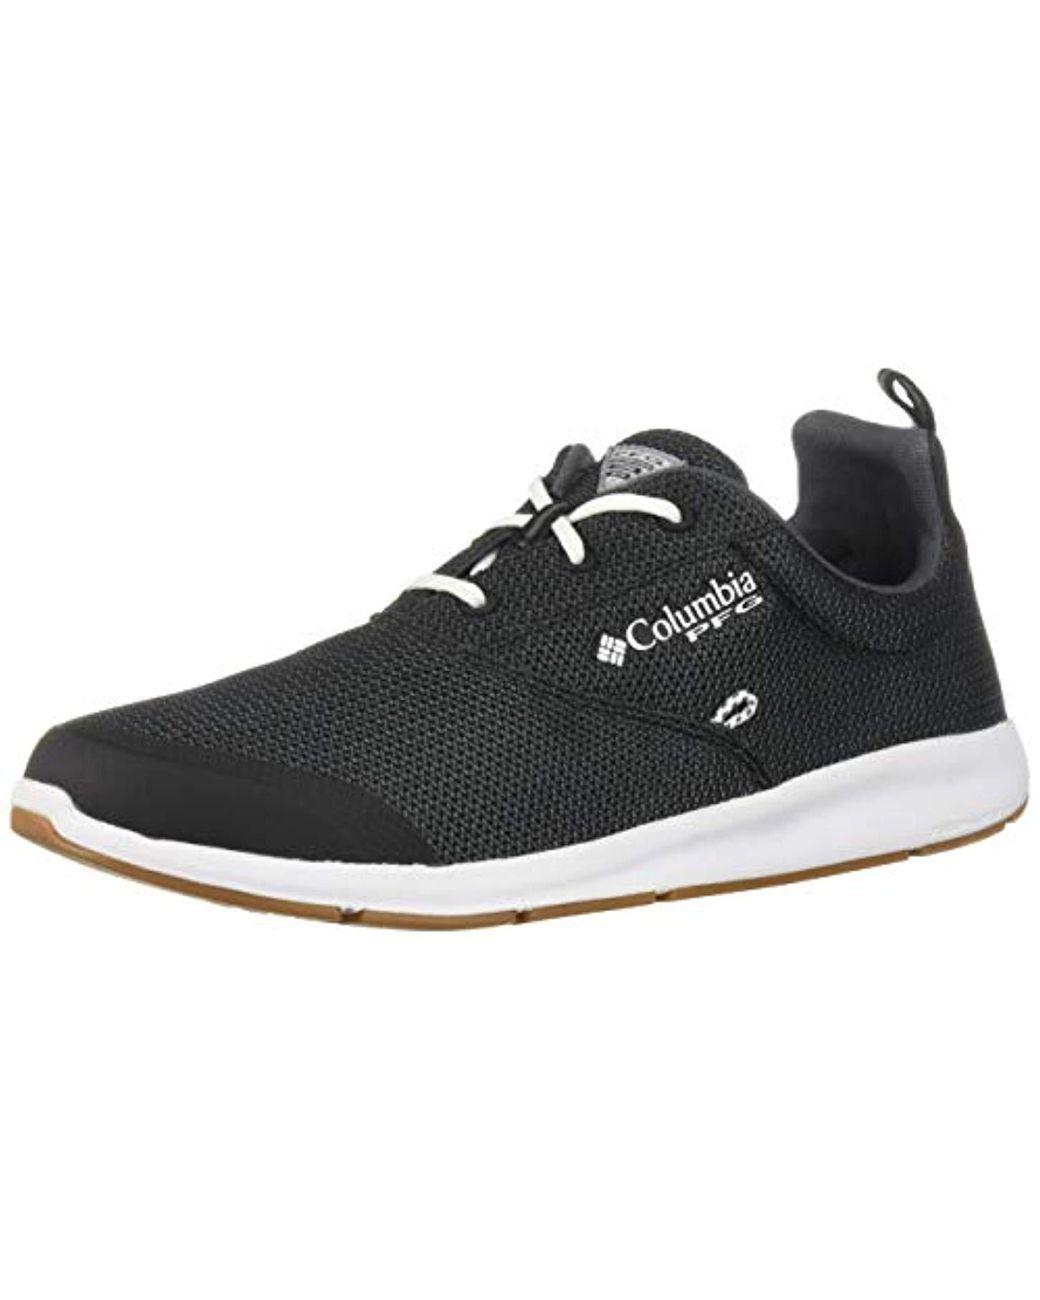 d4a8a60e3b419 Men's Black Delray Cvo Pfg Boat Shoe